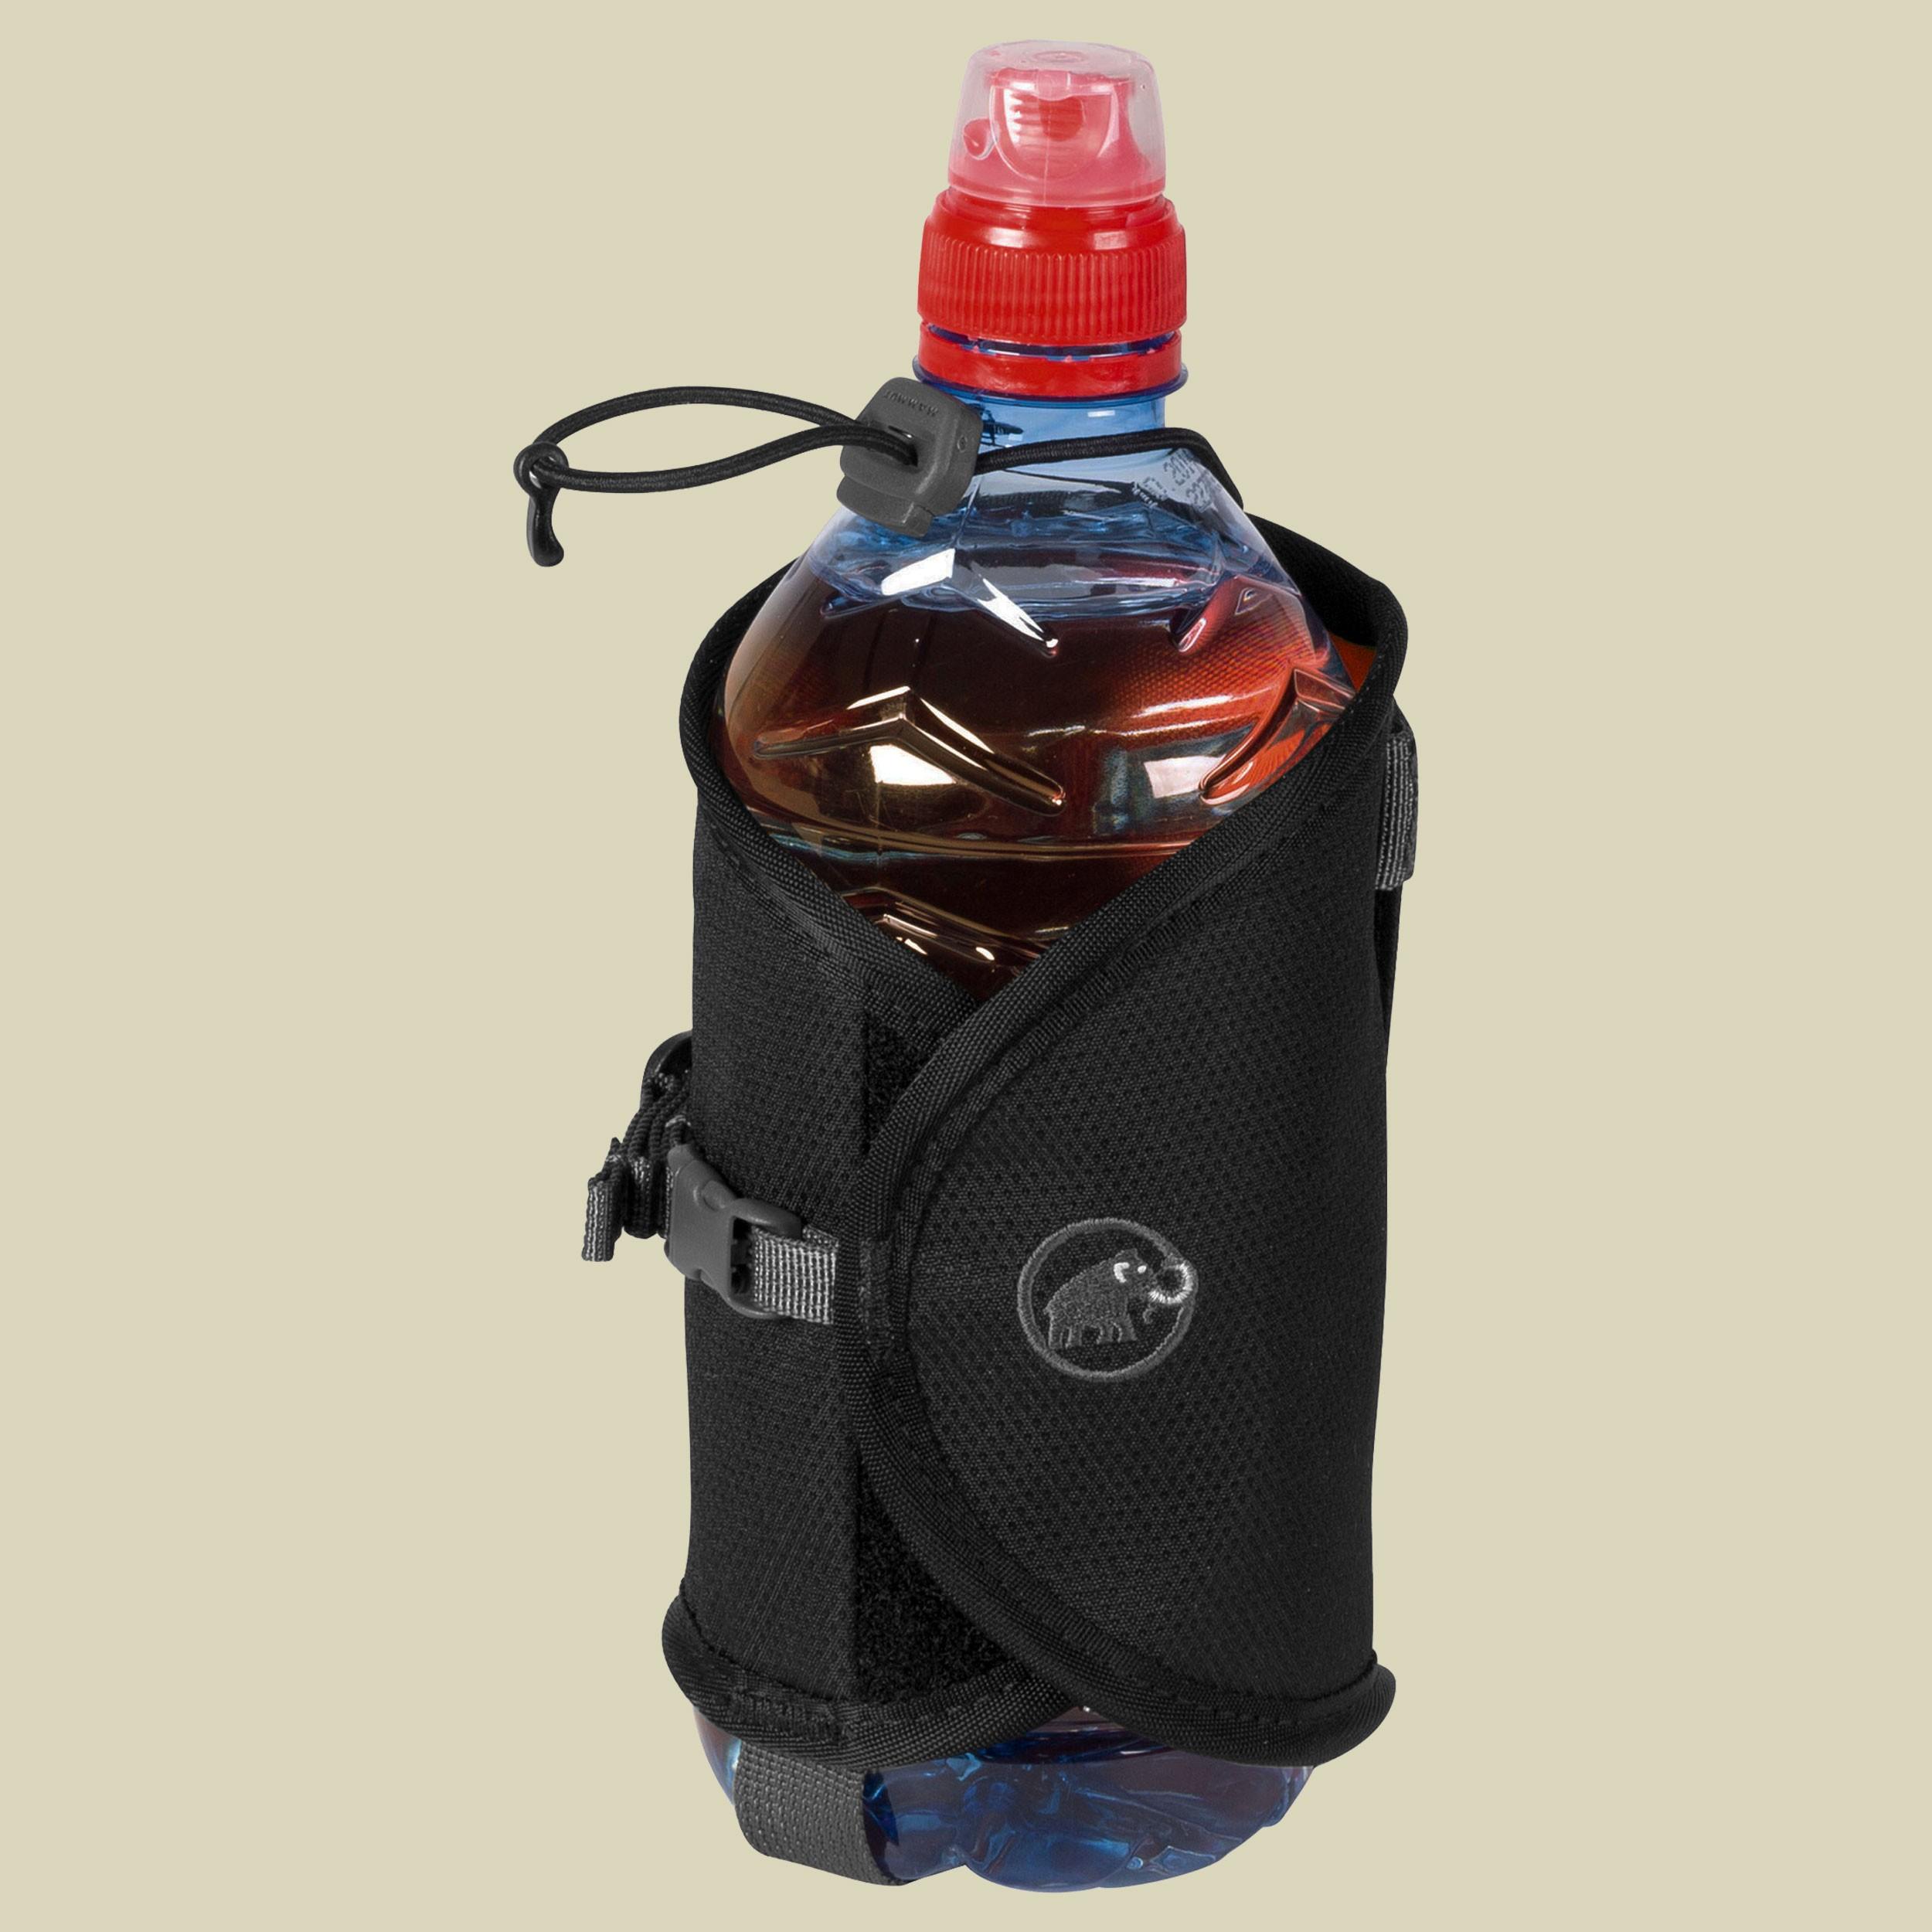 mammut_Add_on_bottle_holder_black_front_2530_00100_0001_fallback